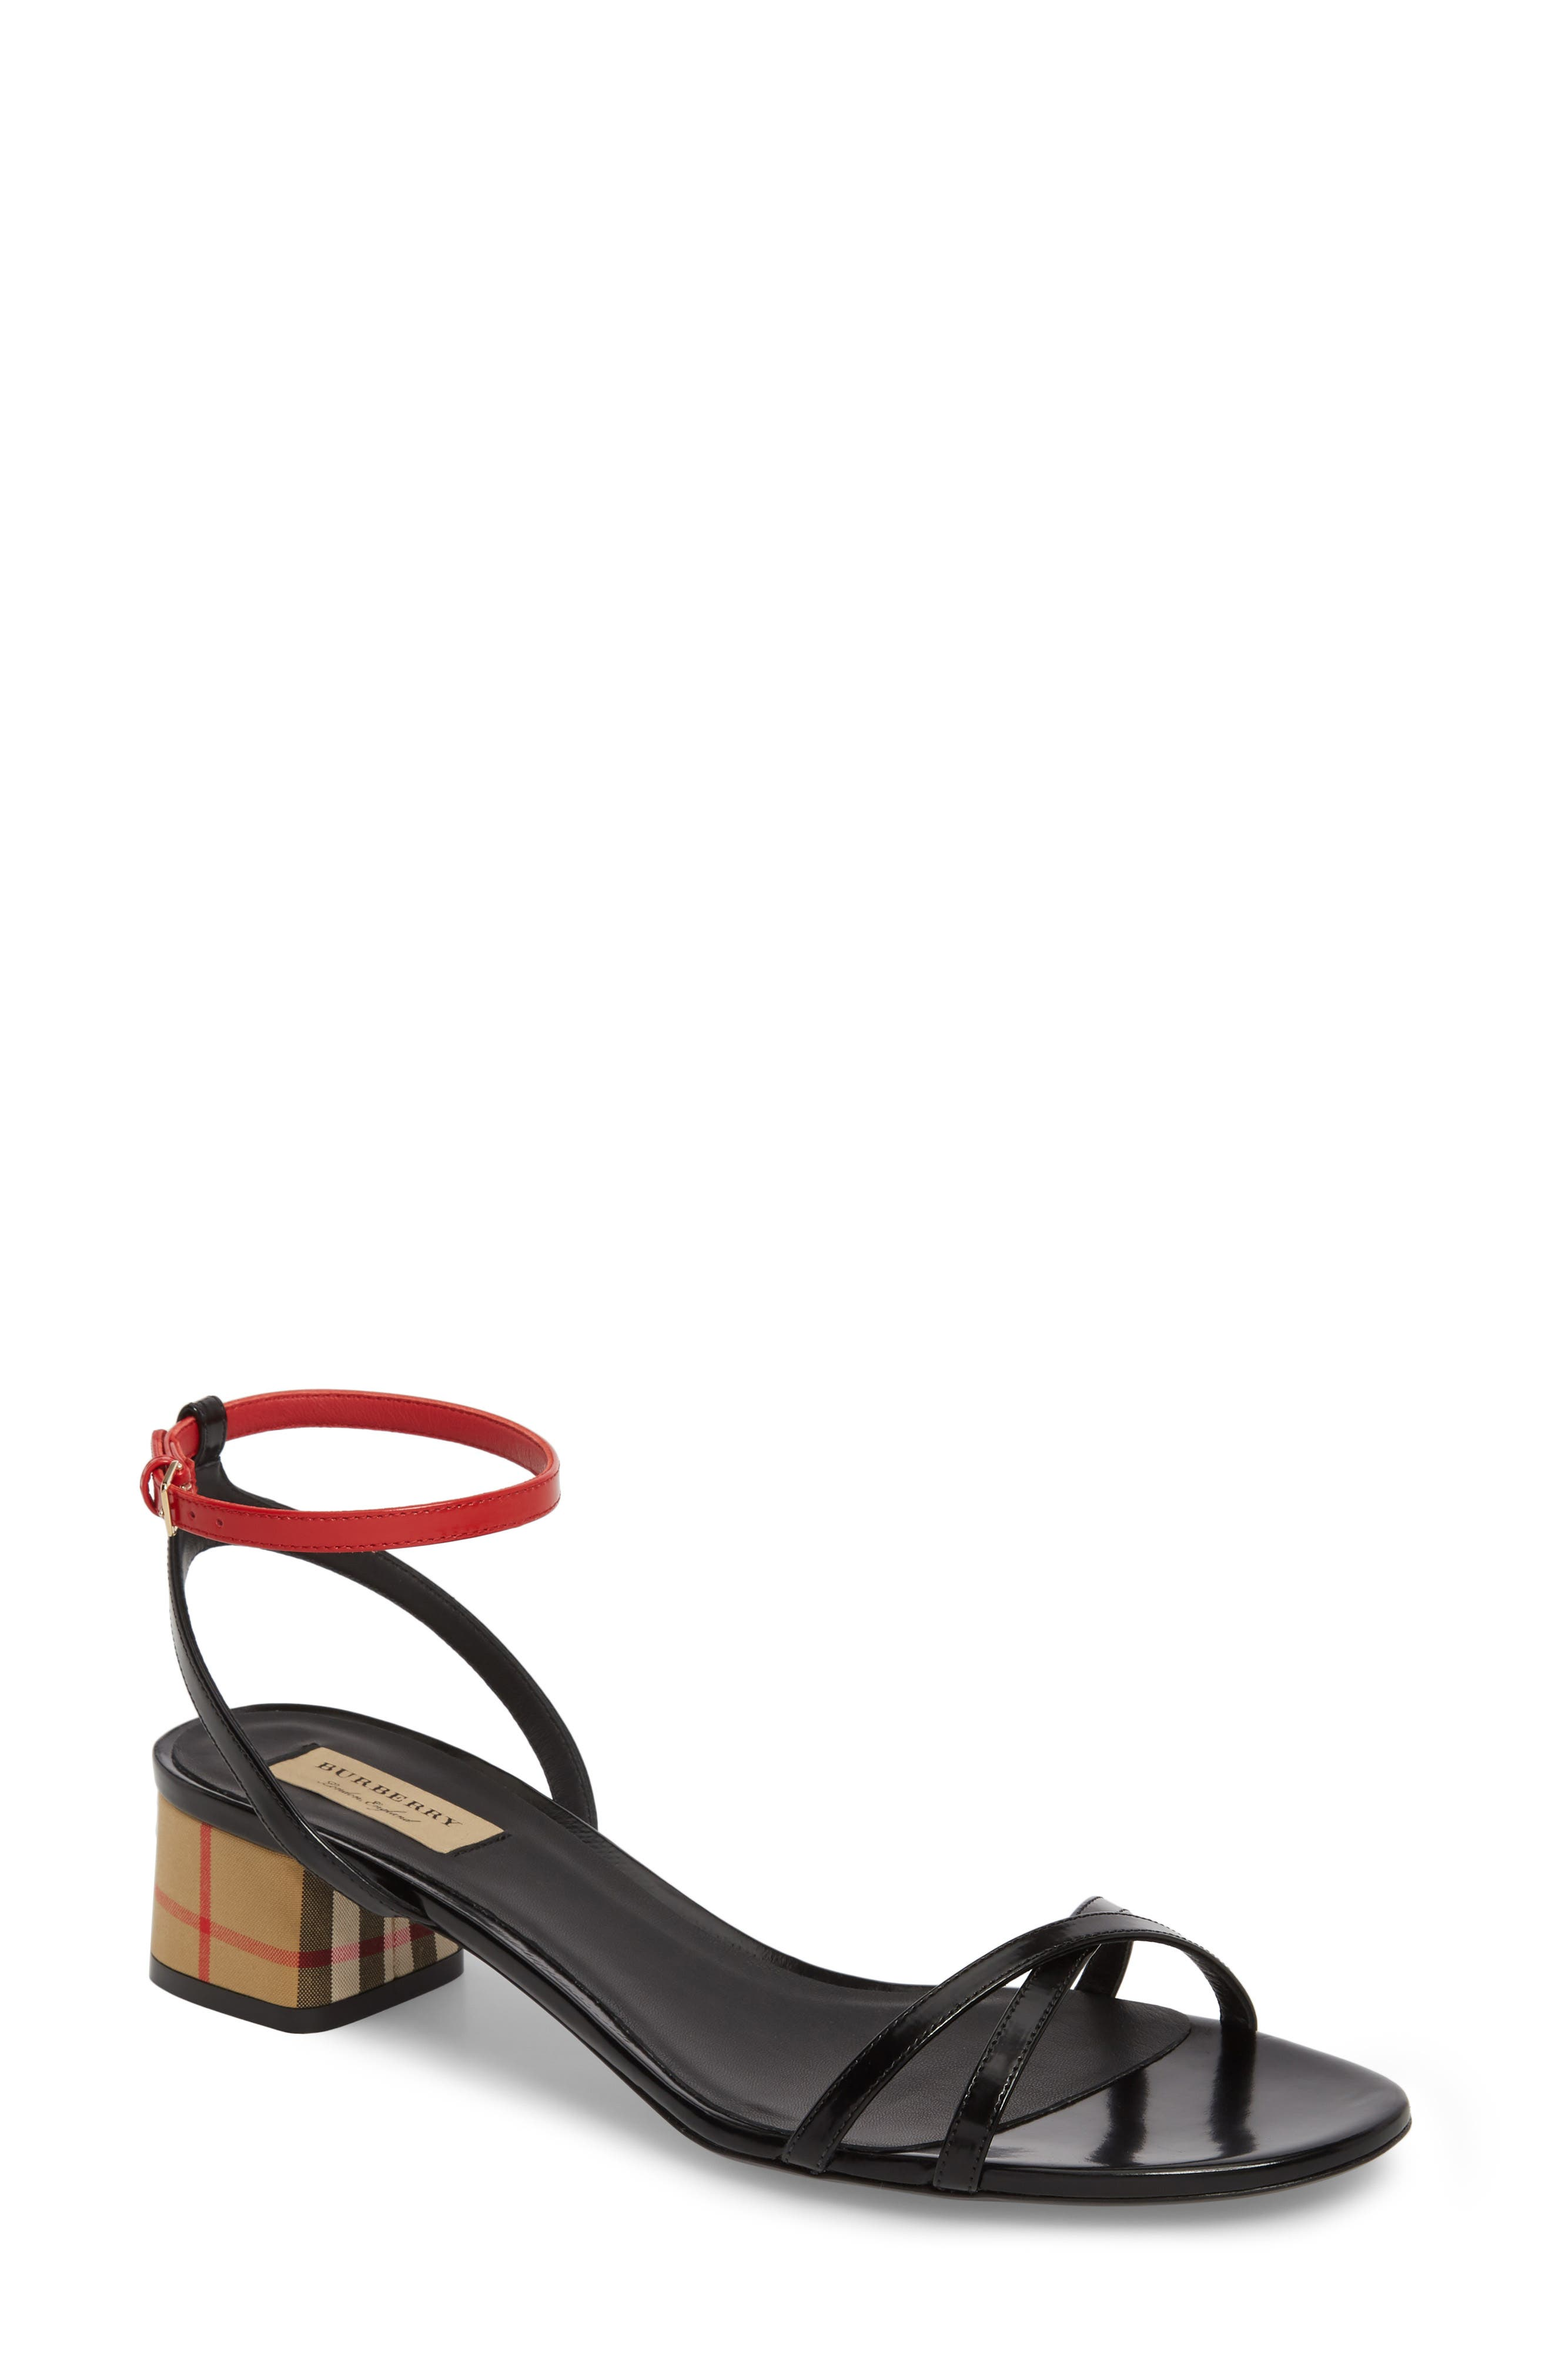 Anthea Check Ankle Strap Sandal,                             Main thumbnail 1, color,                             Black